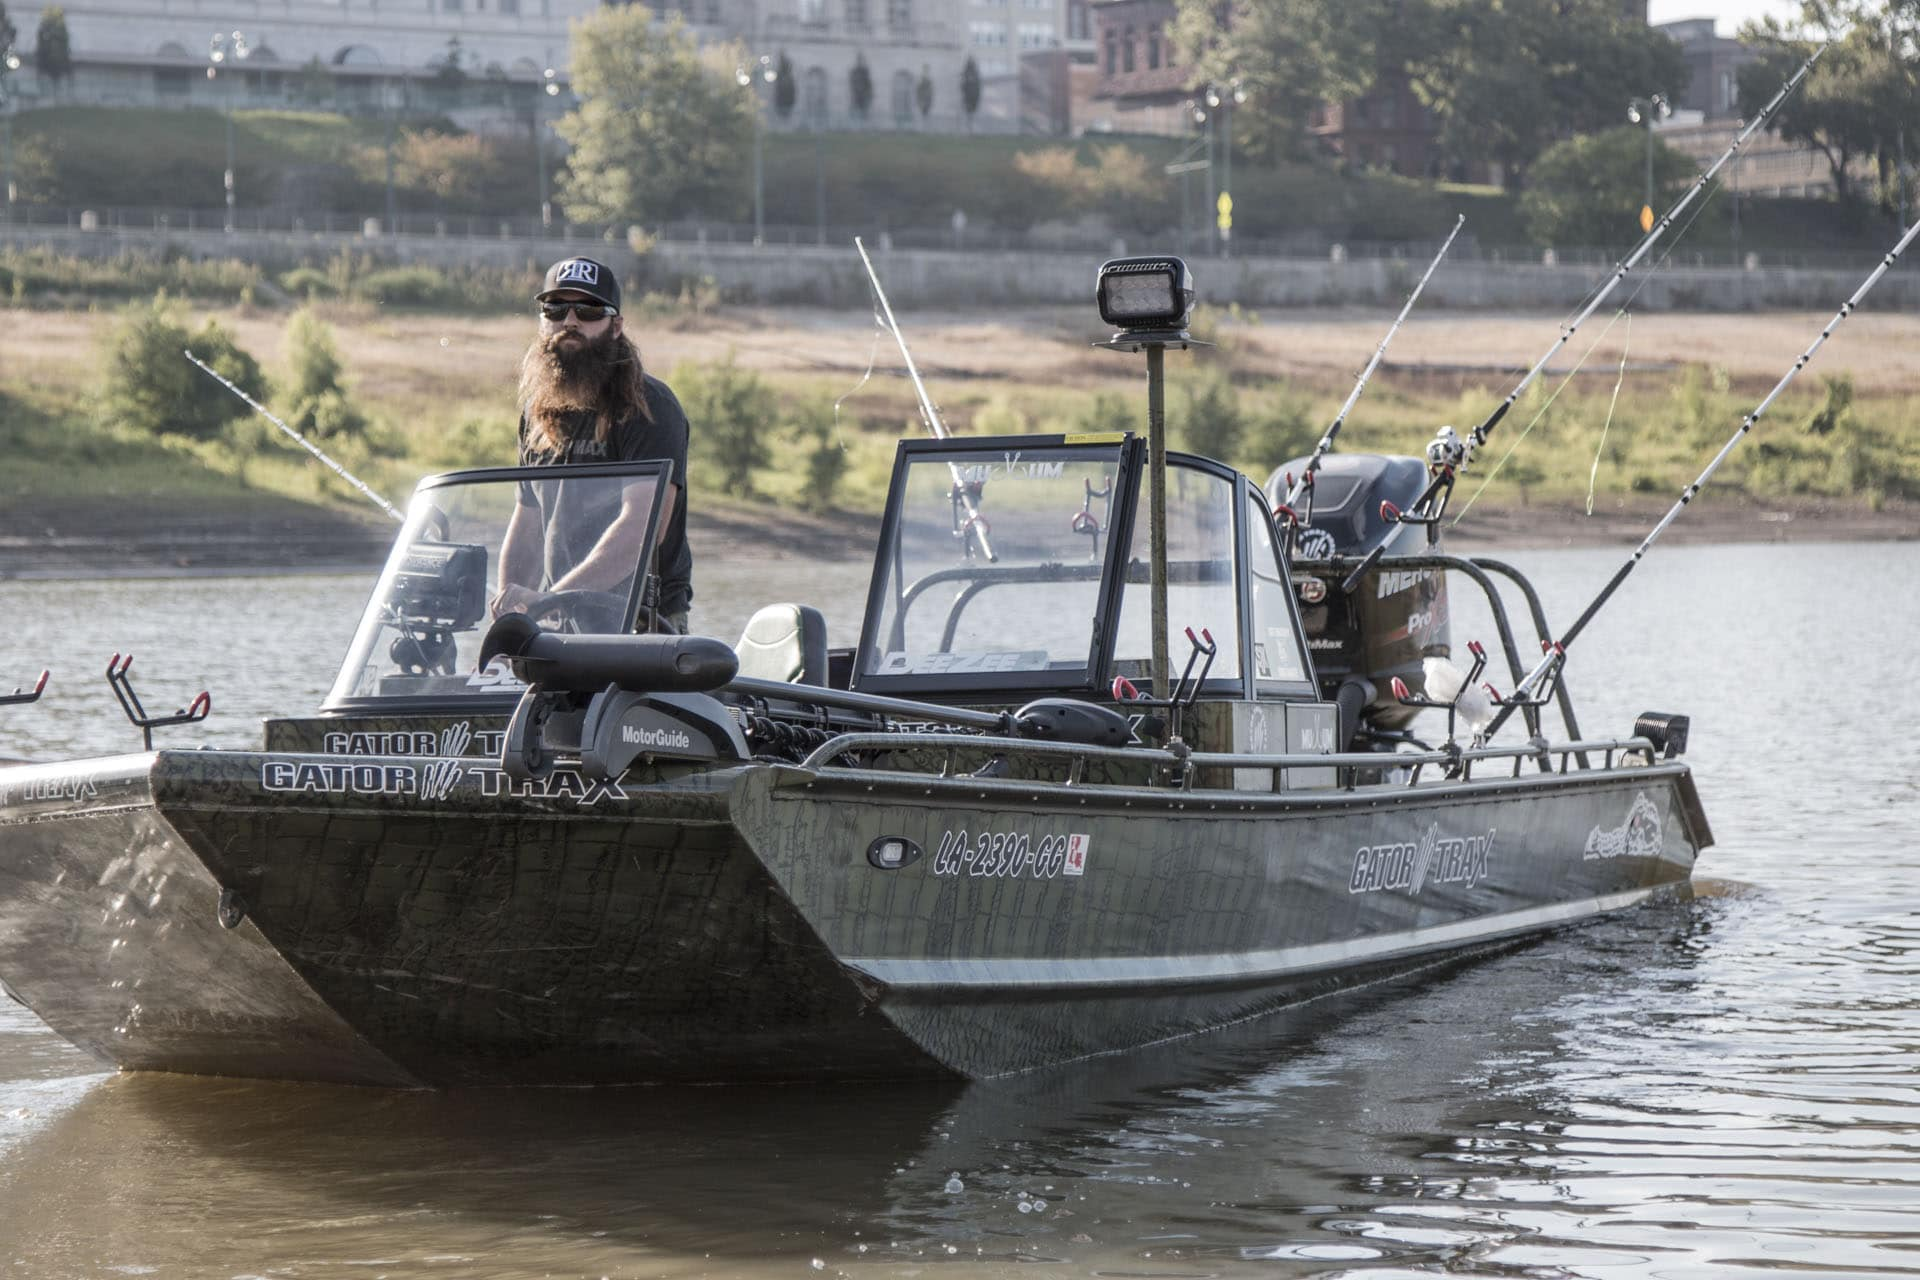 Gator Trax Boats Fleet backed by a Lifetime Warranty - Gator Trax Boats